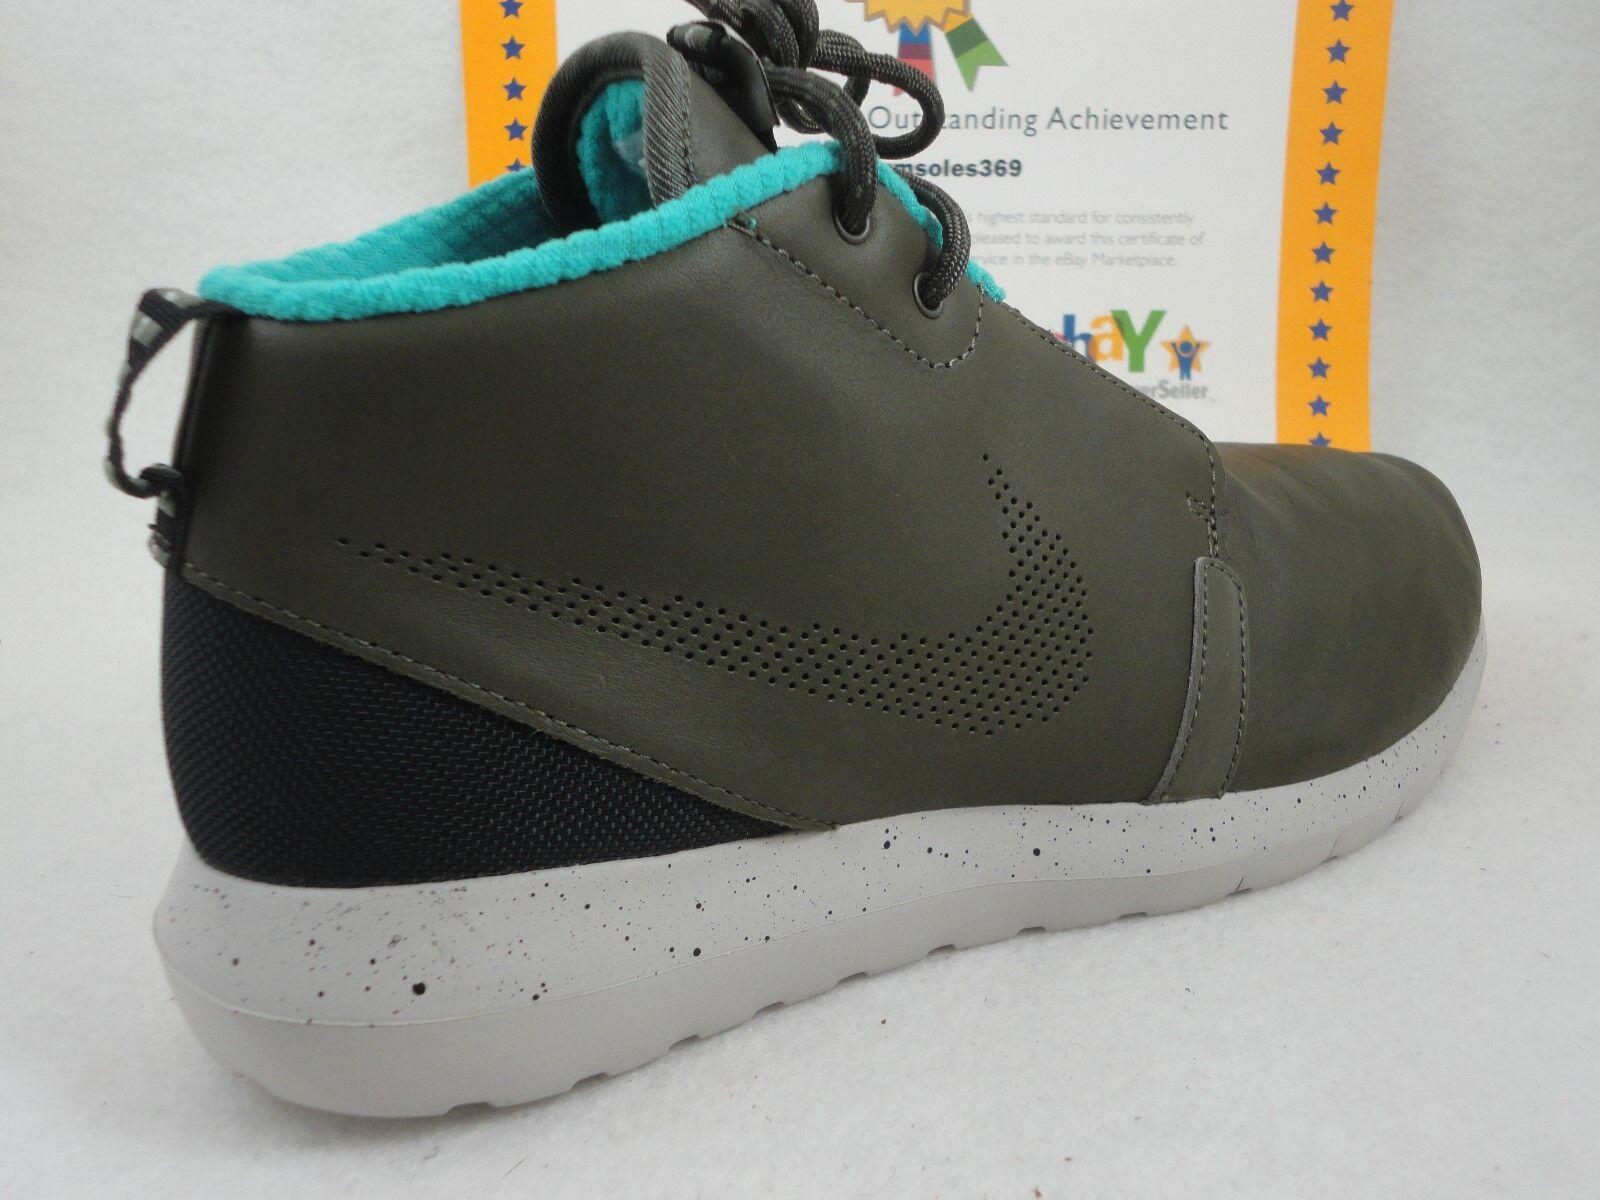 Nike Rosherun NM Snearkerboot Premium, Cargo Khaki   Hyper Jade, Size 8